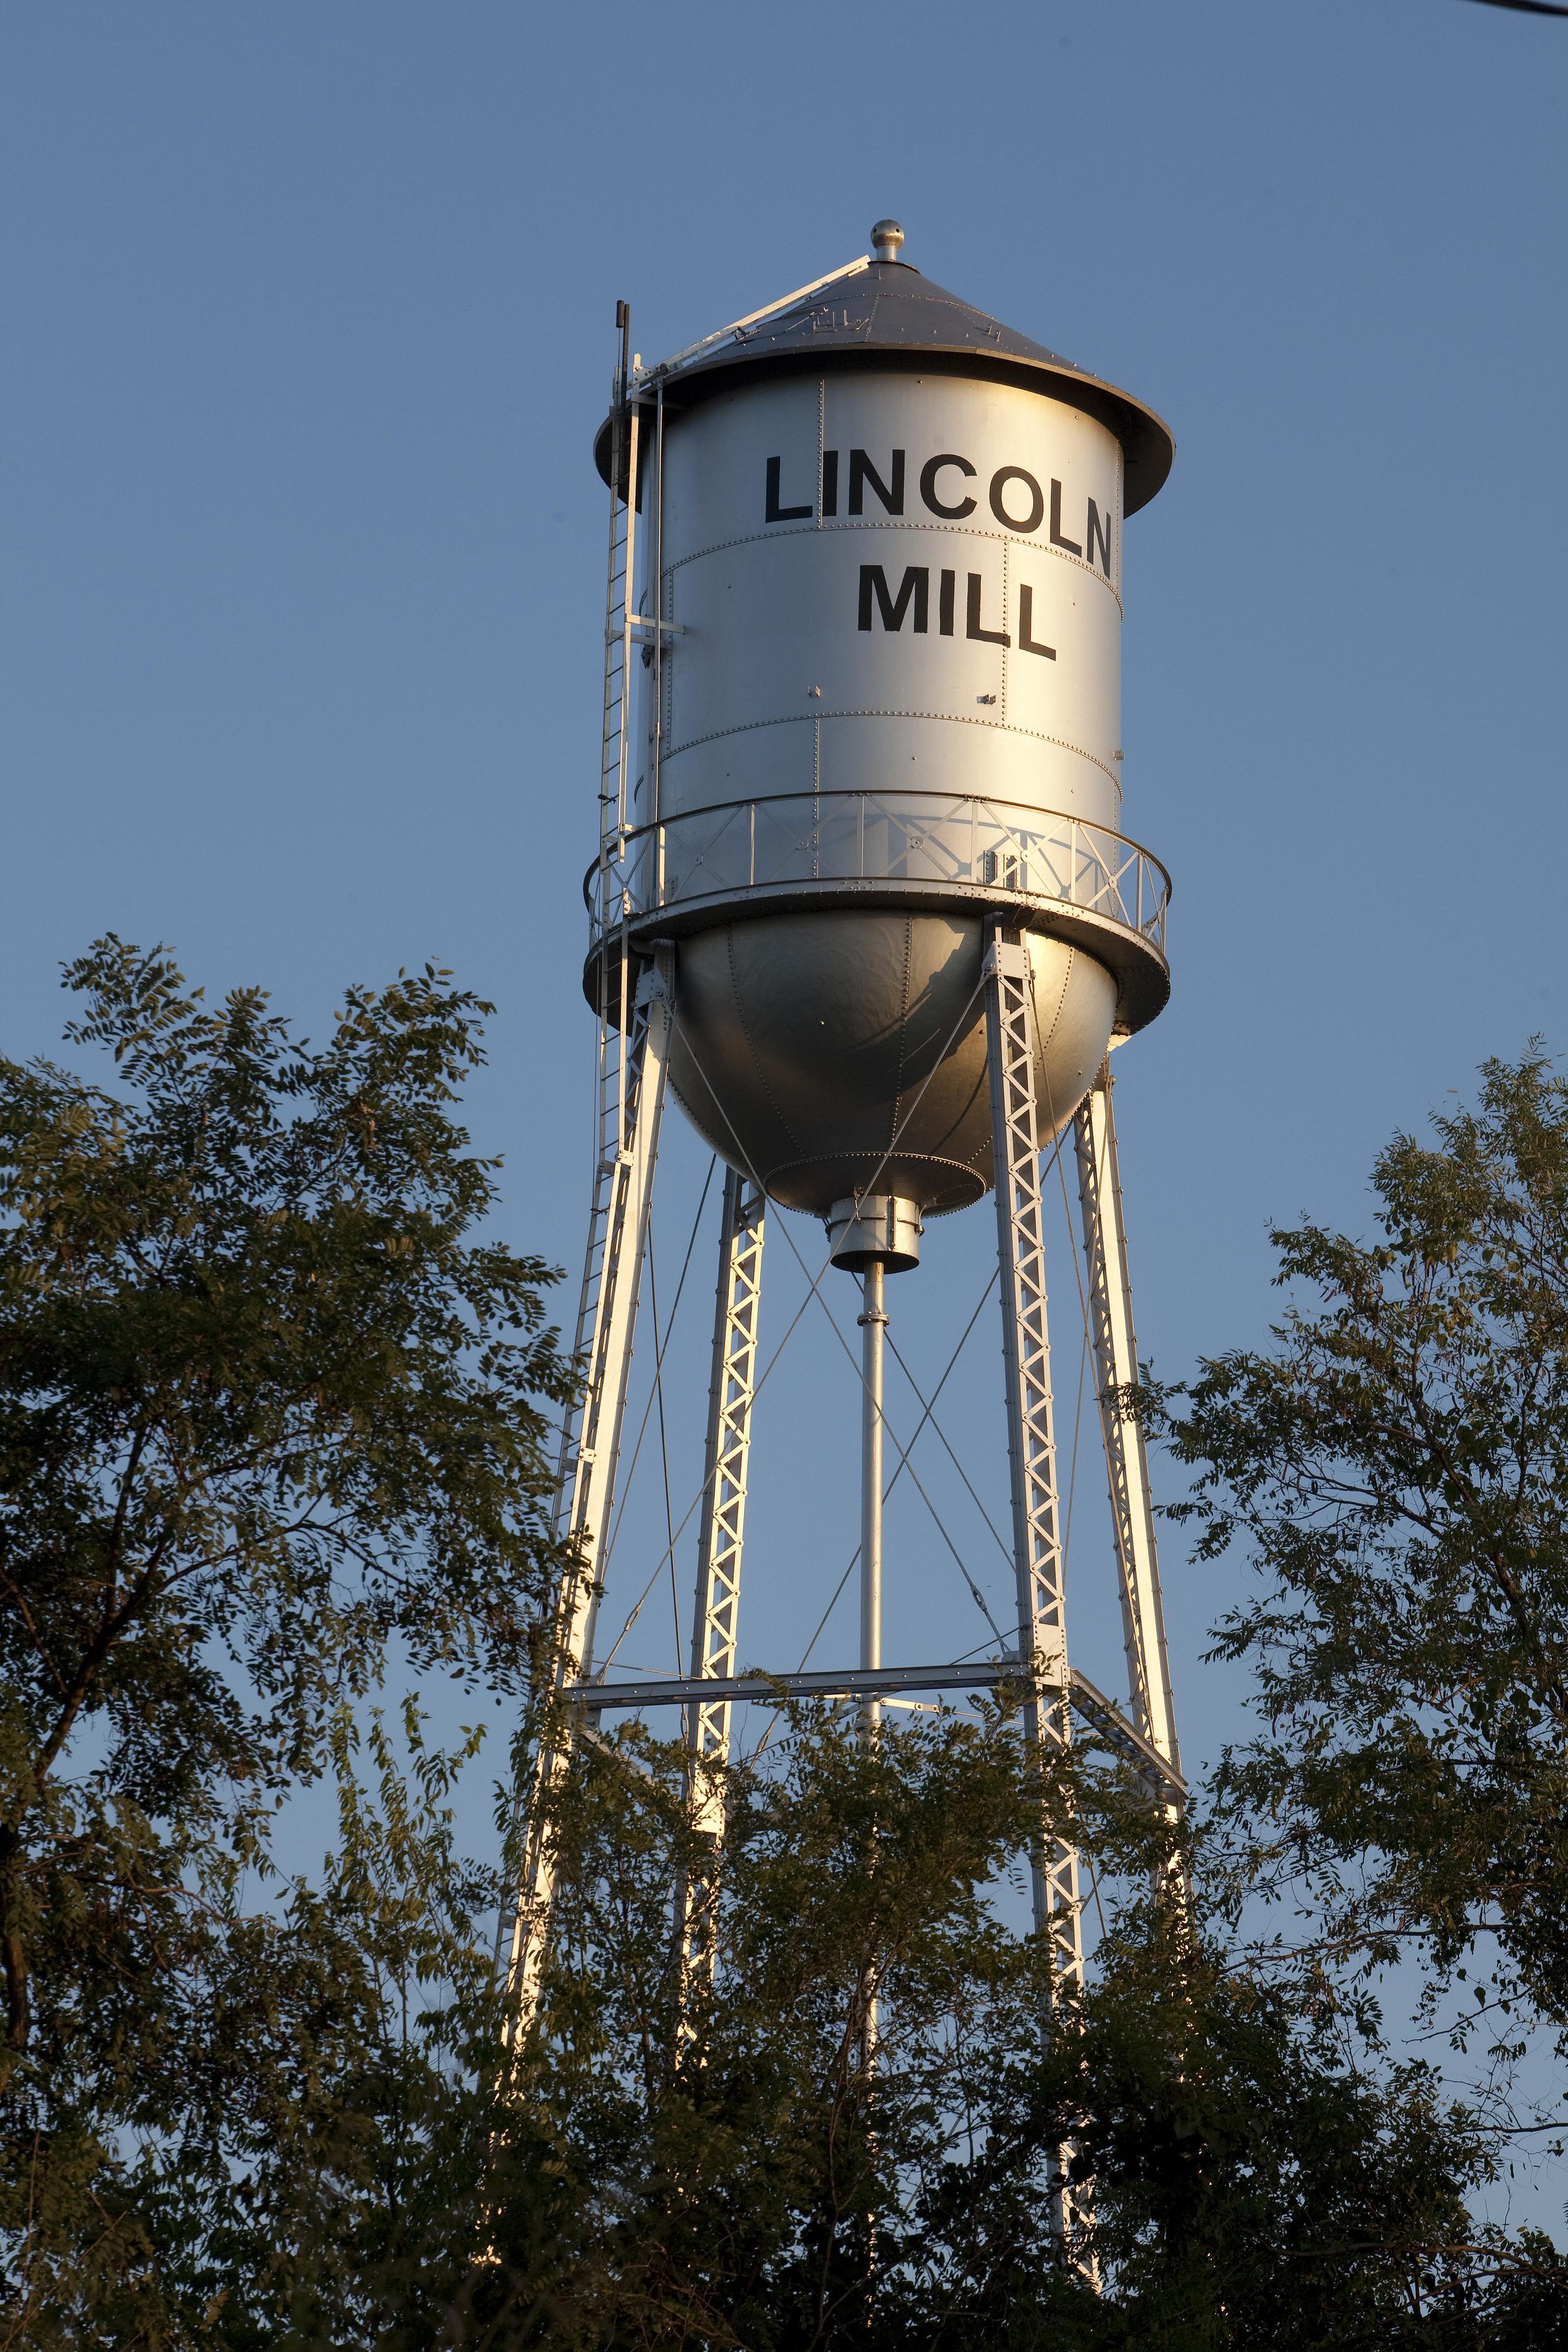 1-LincolnMills100310dKeim-IMG_0542.jpg